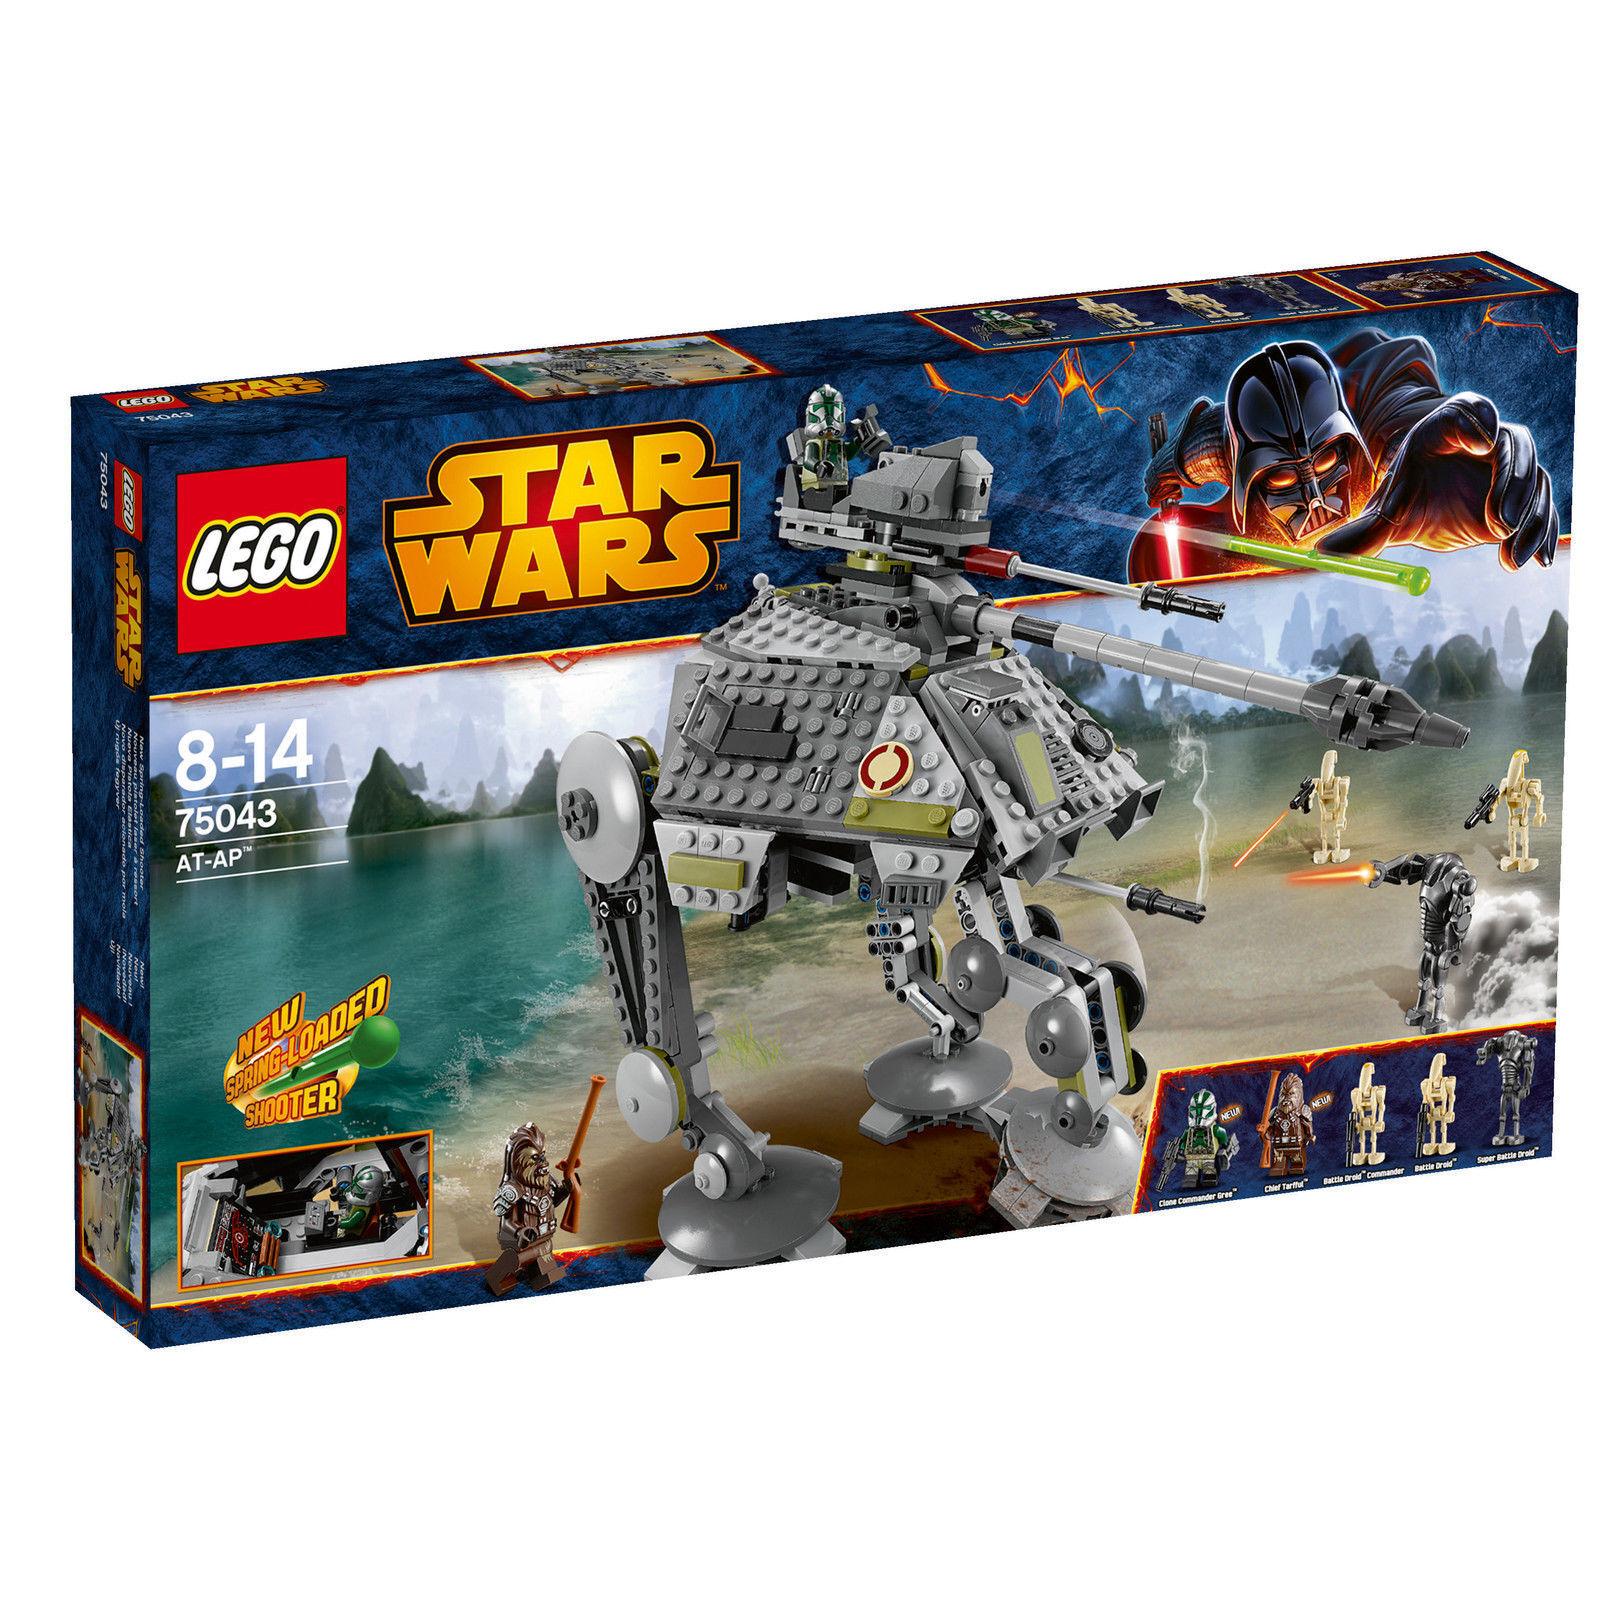 LEGO StarWars AT-AP (75043) neu OVP MISB